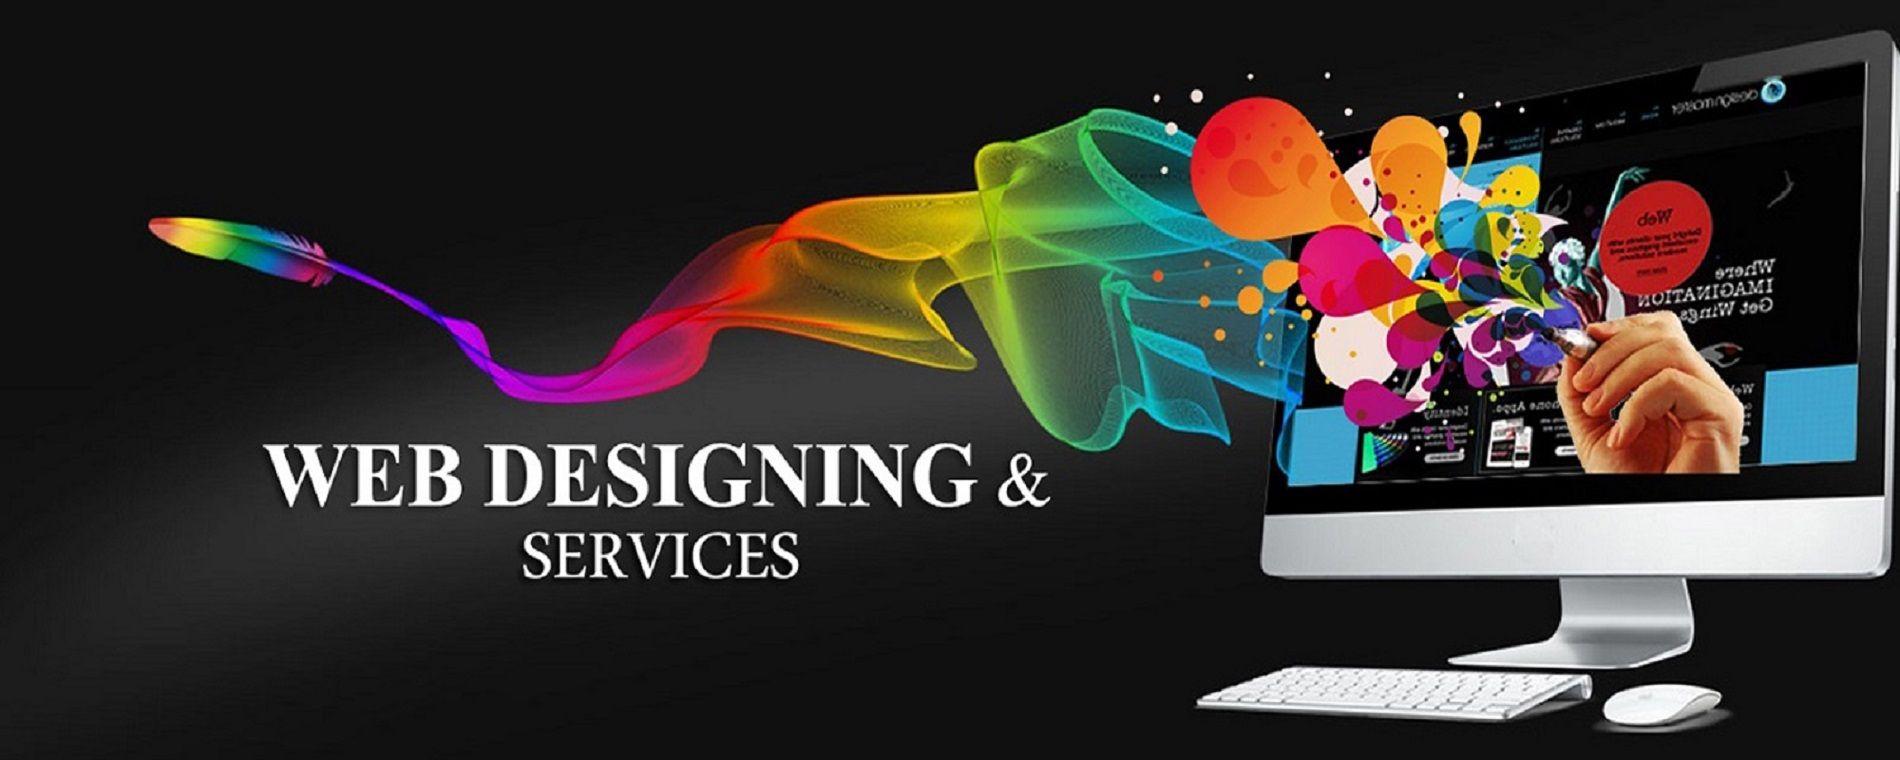 Best Website Design Development Company In Australia Website Design Services Website Design Company Fun Website Design